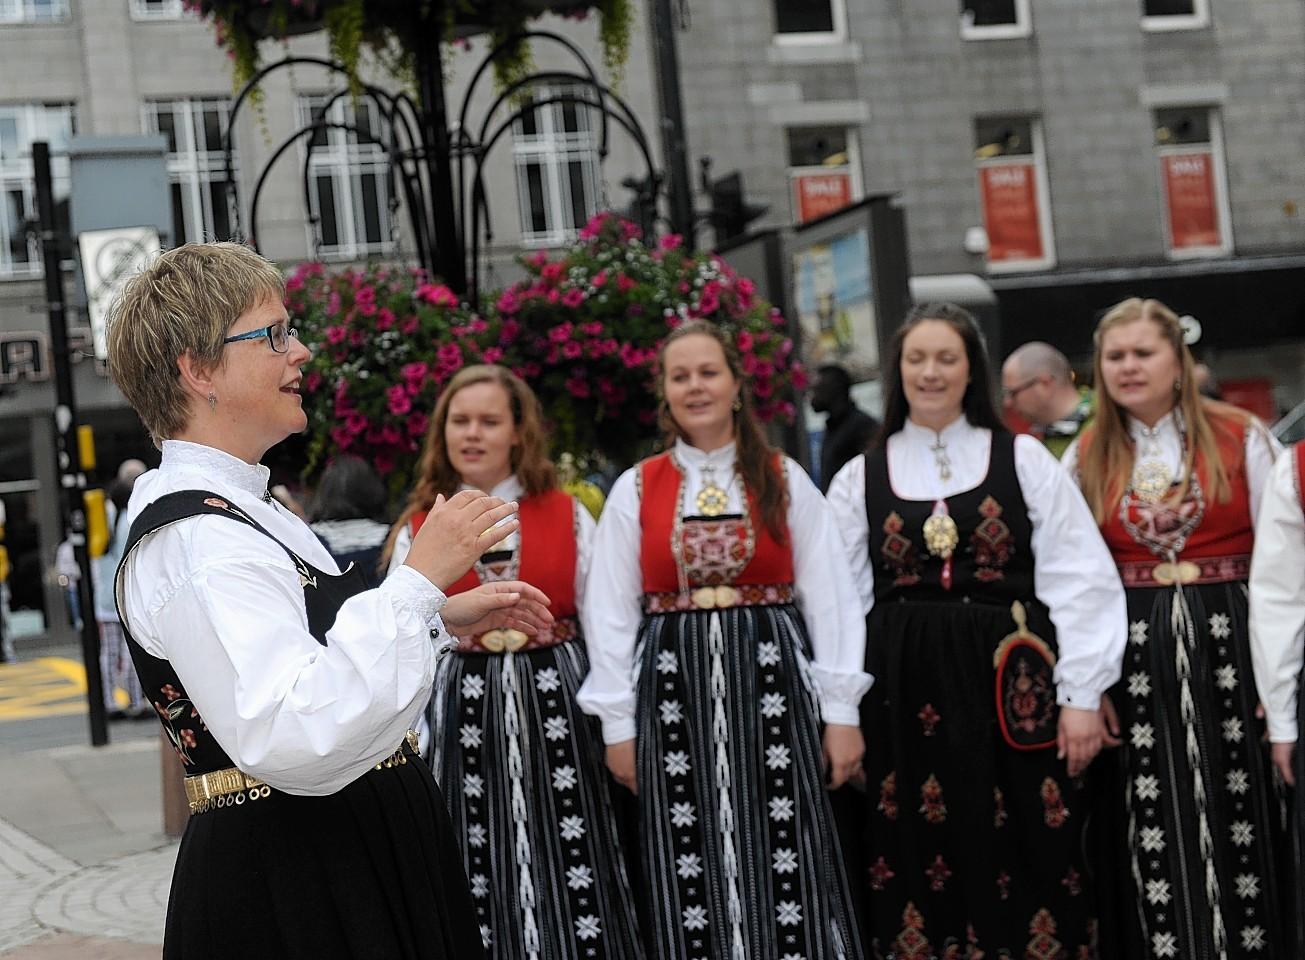 Aberdeen International Youth Festival. Norwegian Choir 'Stord Ungdomskor' performing.